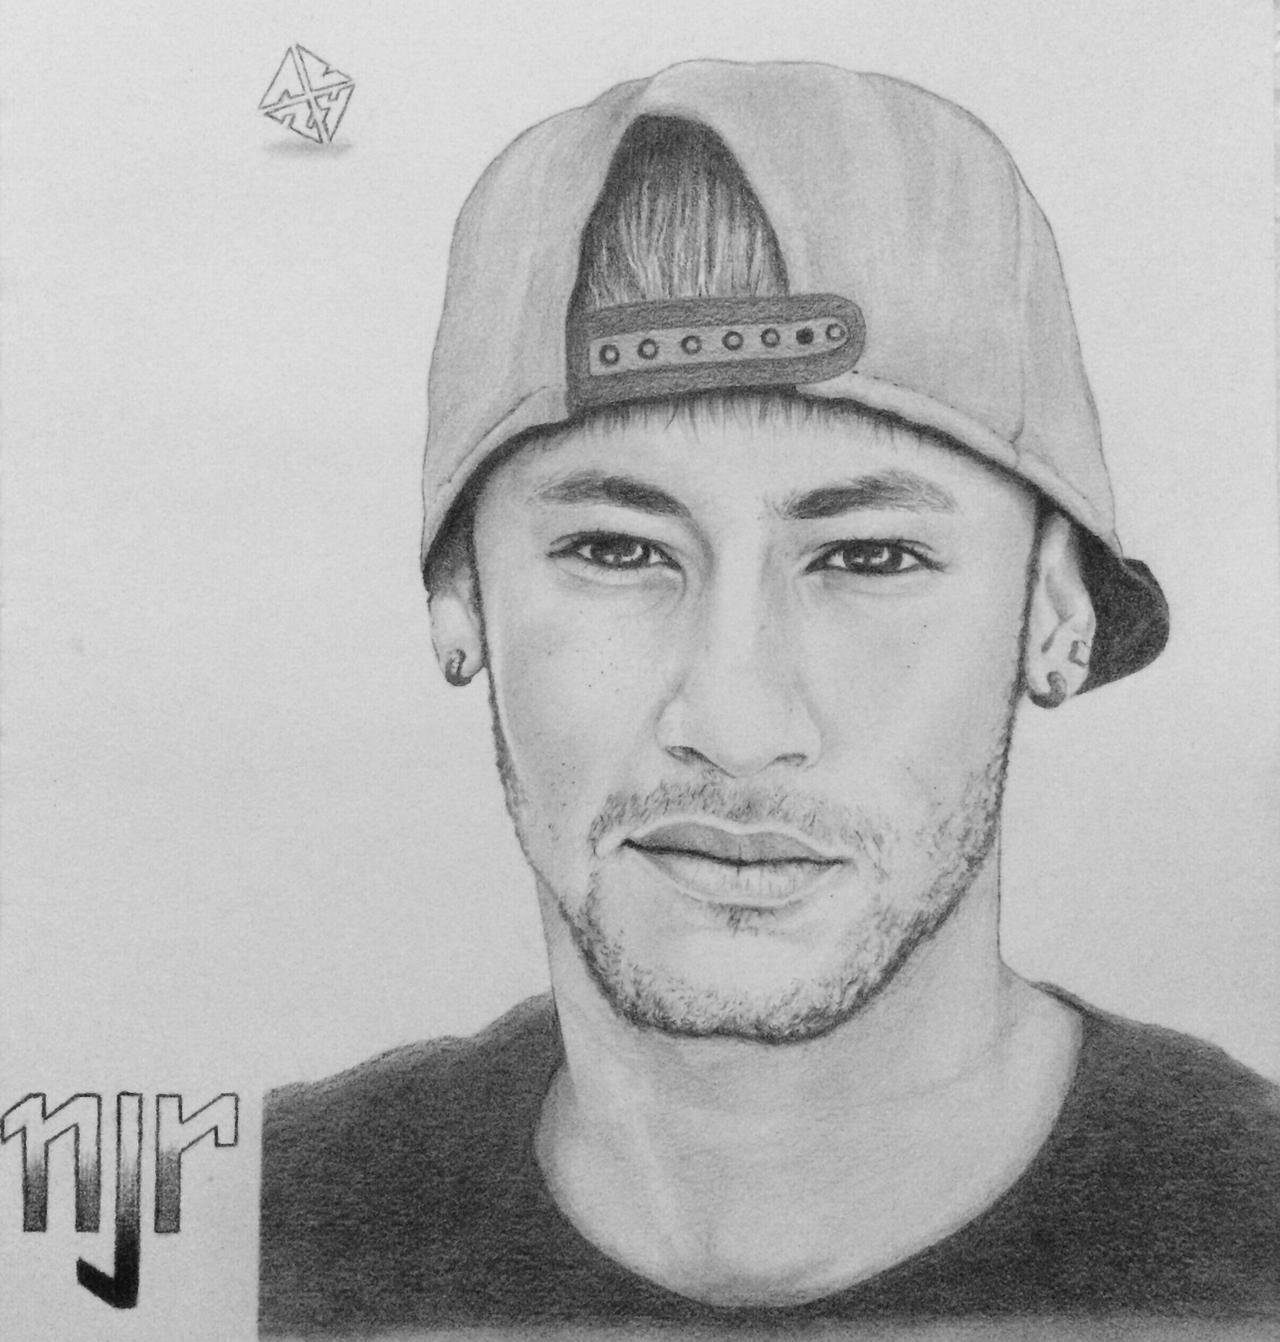 Neymar Portrait Sketch By Ab24rt On Deviantart